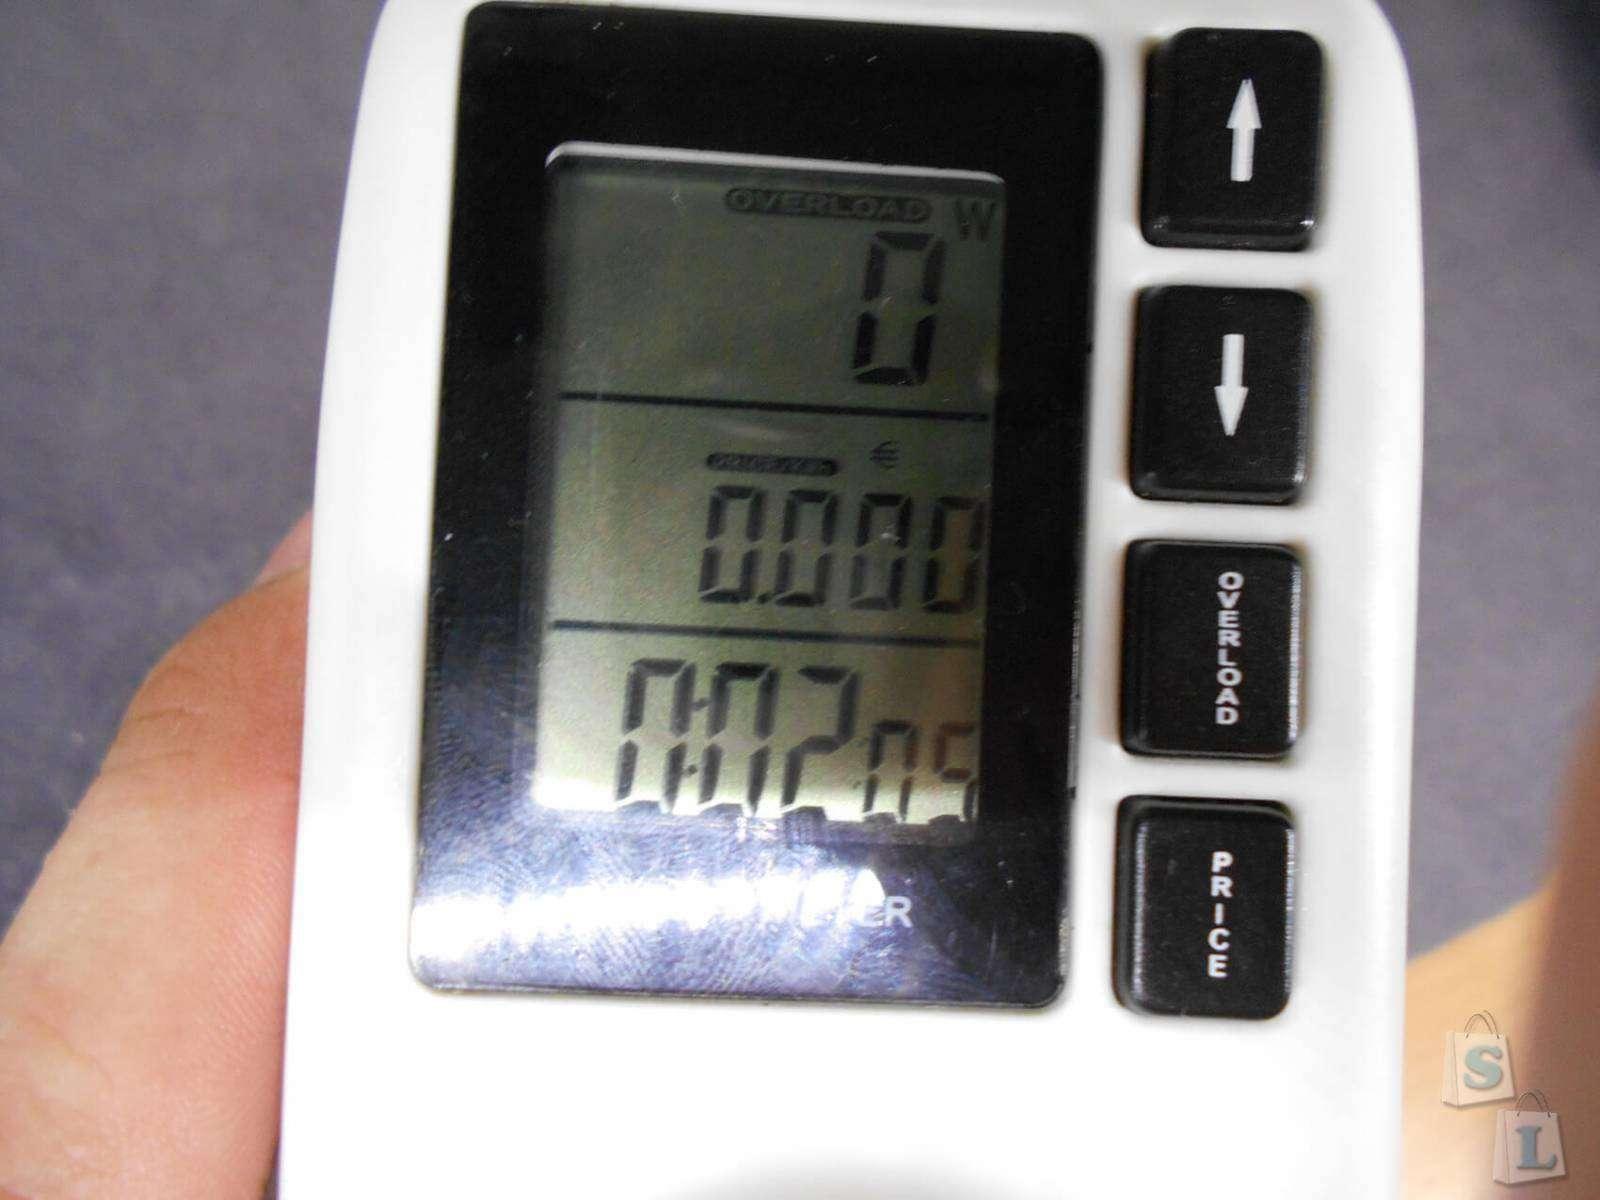 Aliexpress: Цифровой вольтамперметр. Ваттметр от компании eco-sources.